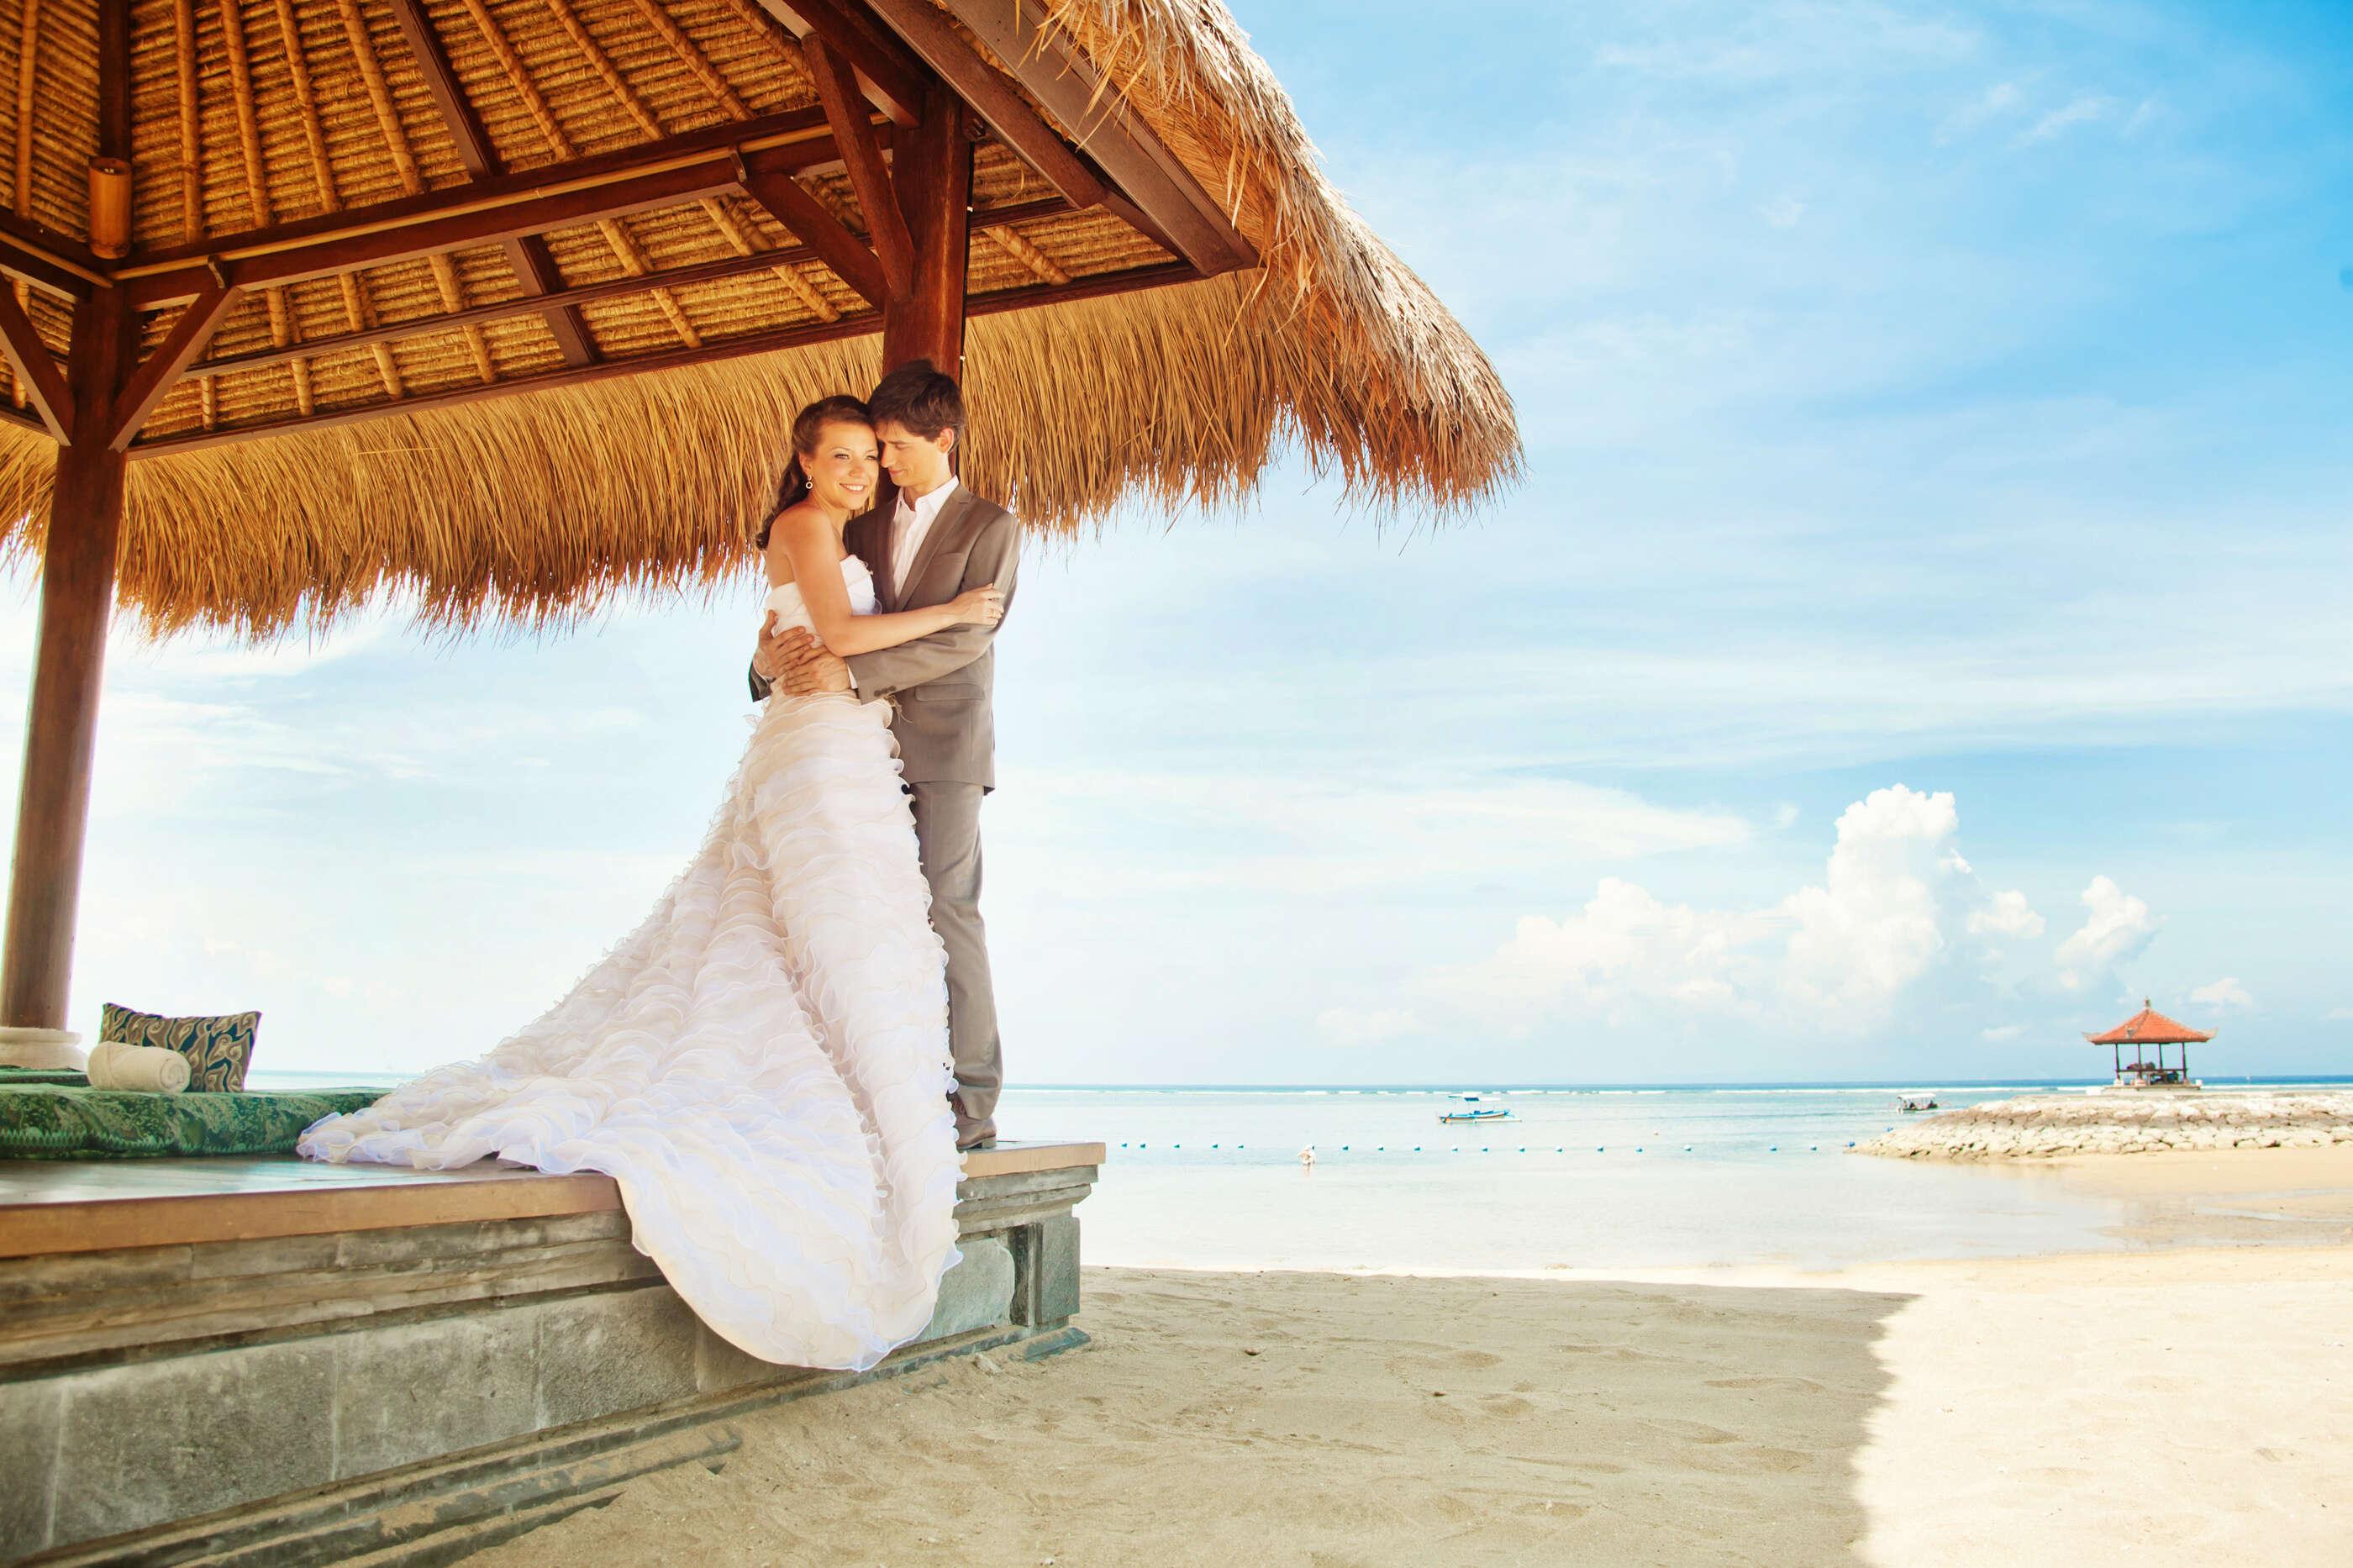 Canada Honeymoon and Romantic Getaway Guide